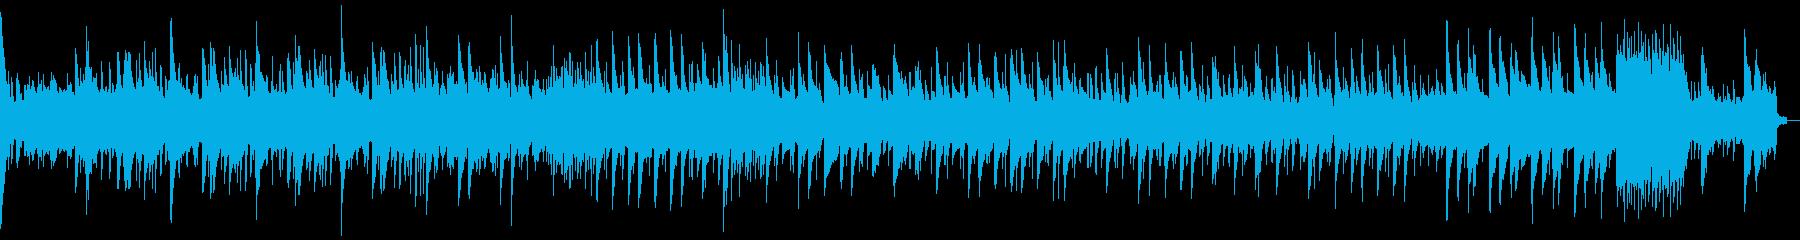 8bitファンタジーな冒険の旅 Ver2の再生済みの波形